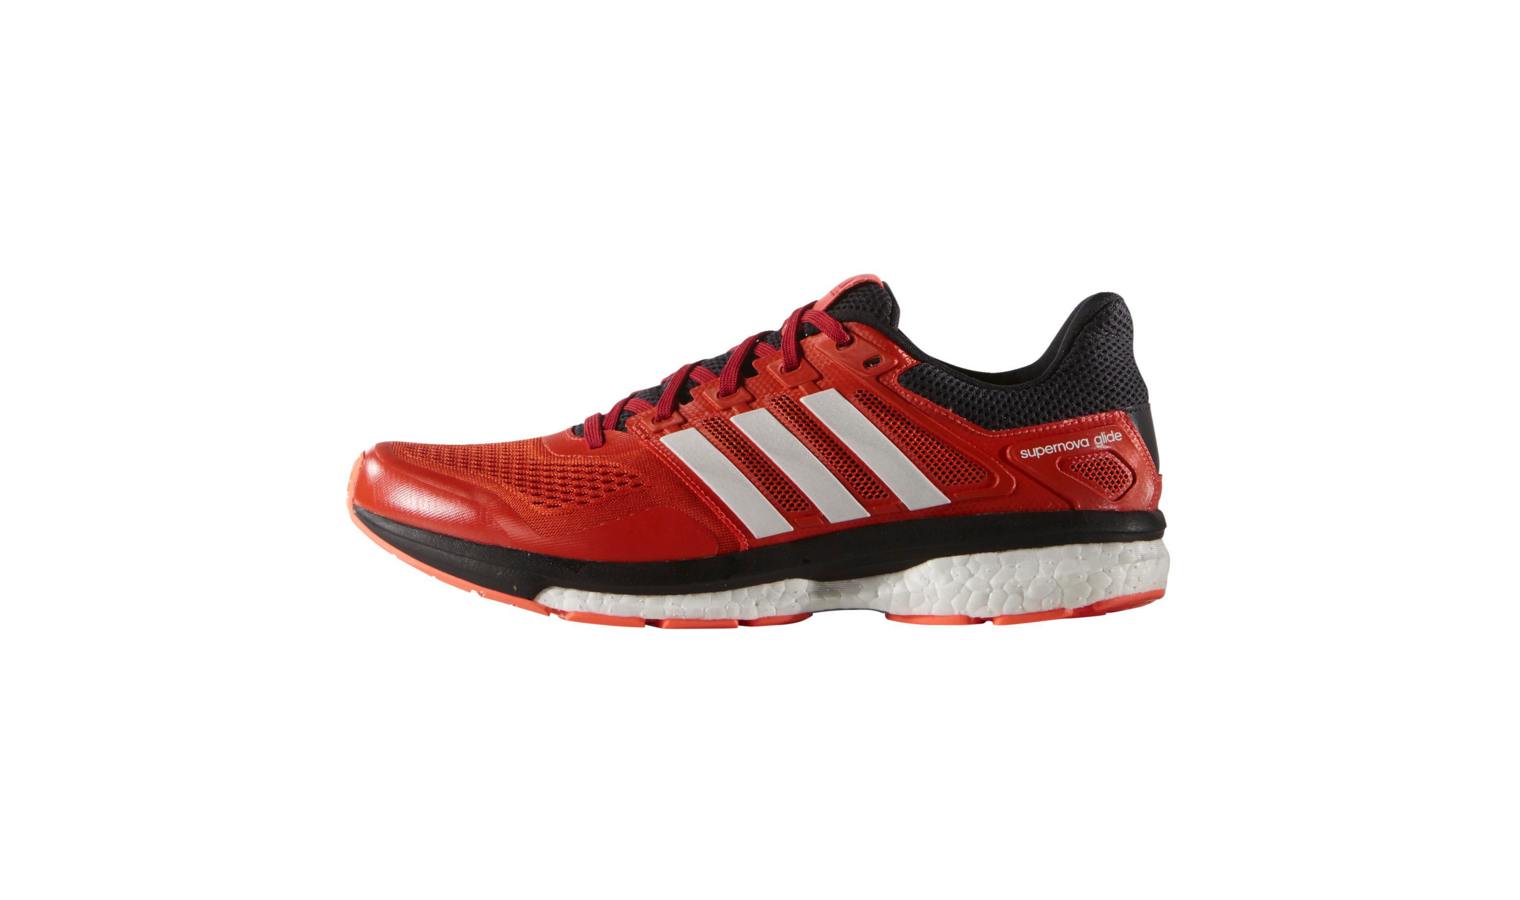 7fe7a23d5d4 Pánské běžecké boty adidas SUPERNOVA GLIDE 8 M červené